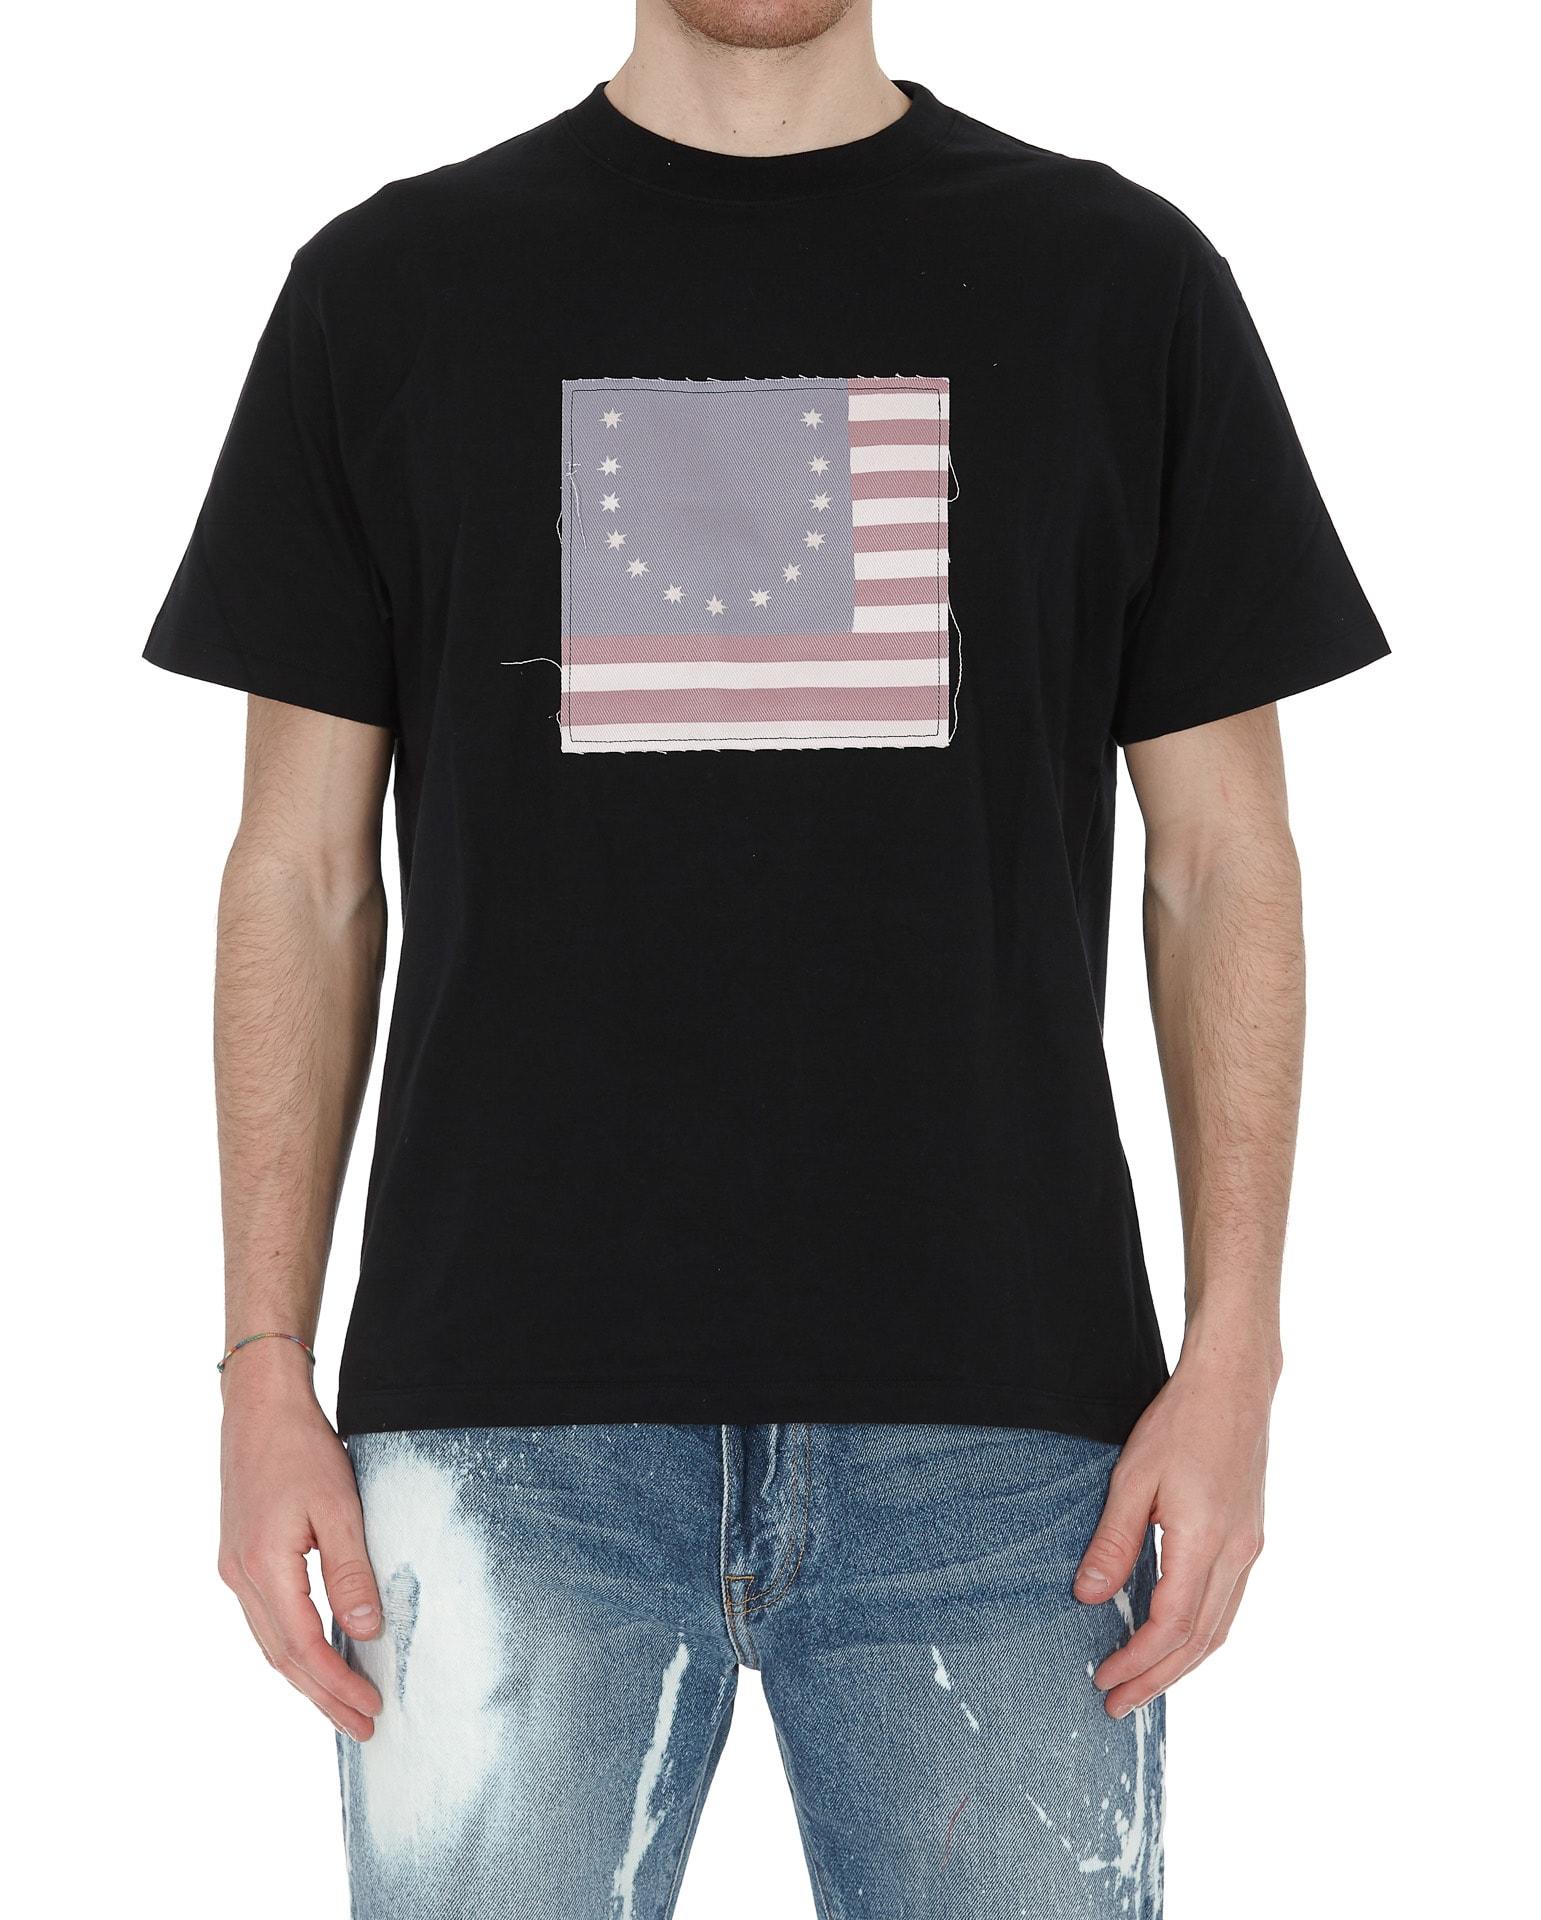 Fourtwofour On Fairfax Smiley Flag T-shirt